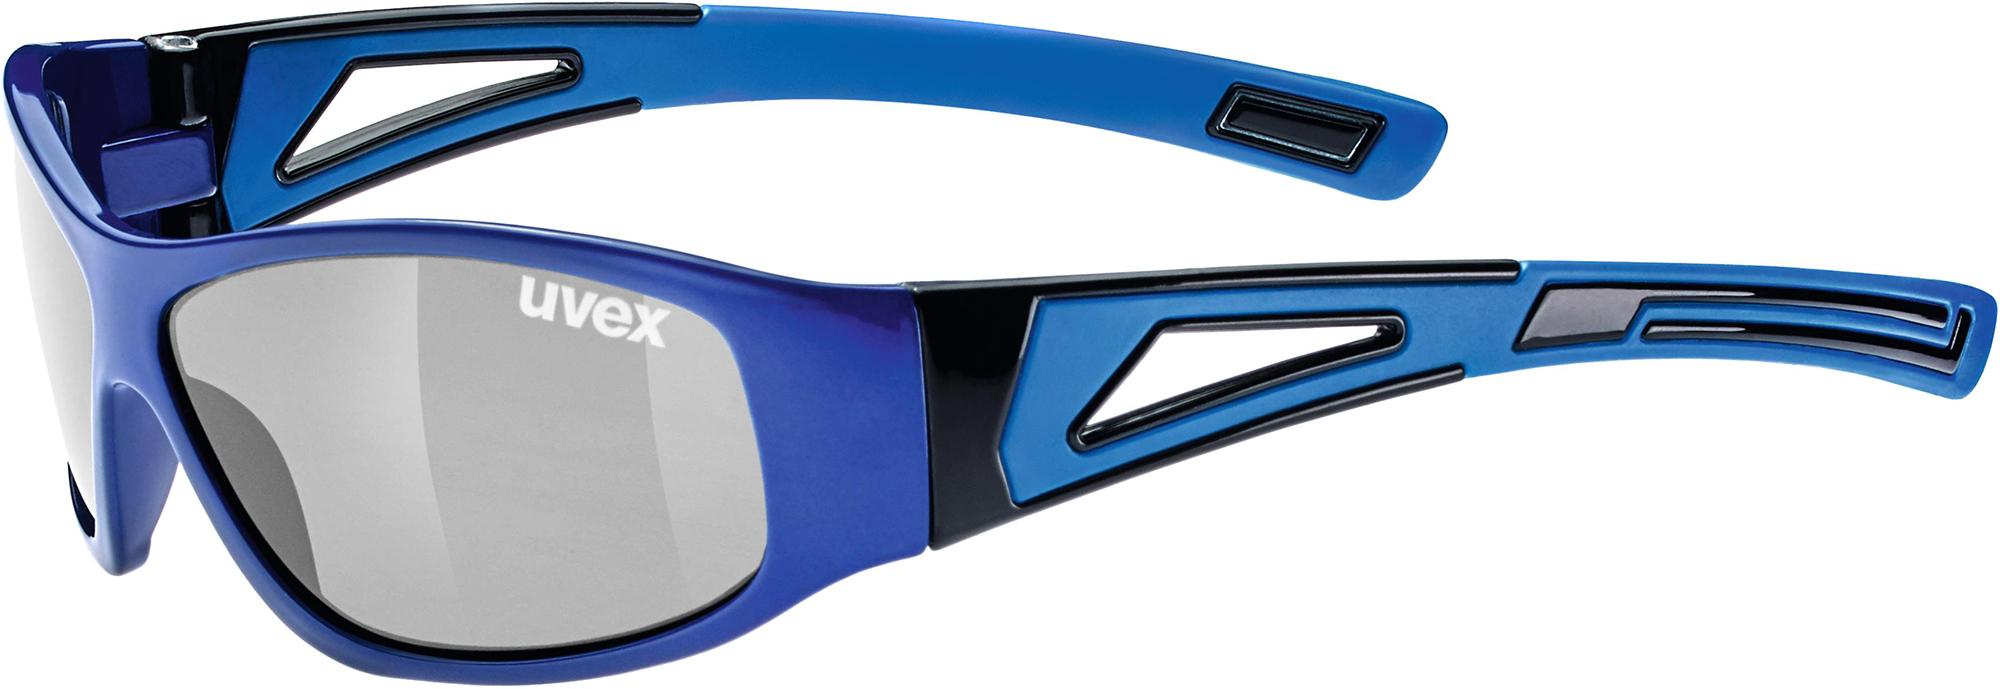 цена на Uvex Солнцезащитные очки детские Uvex Sportstyle 509